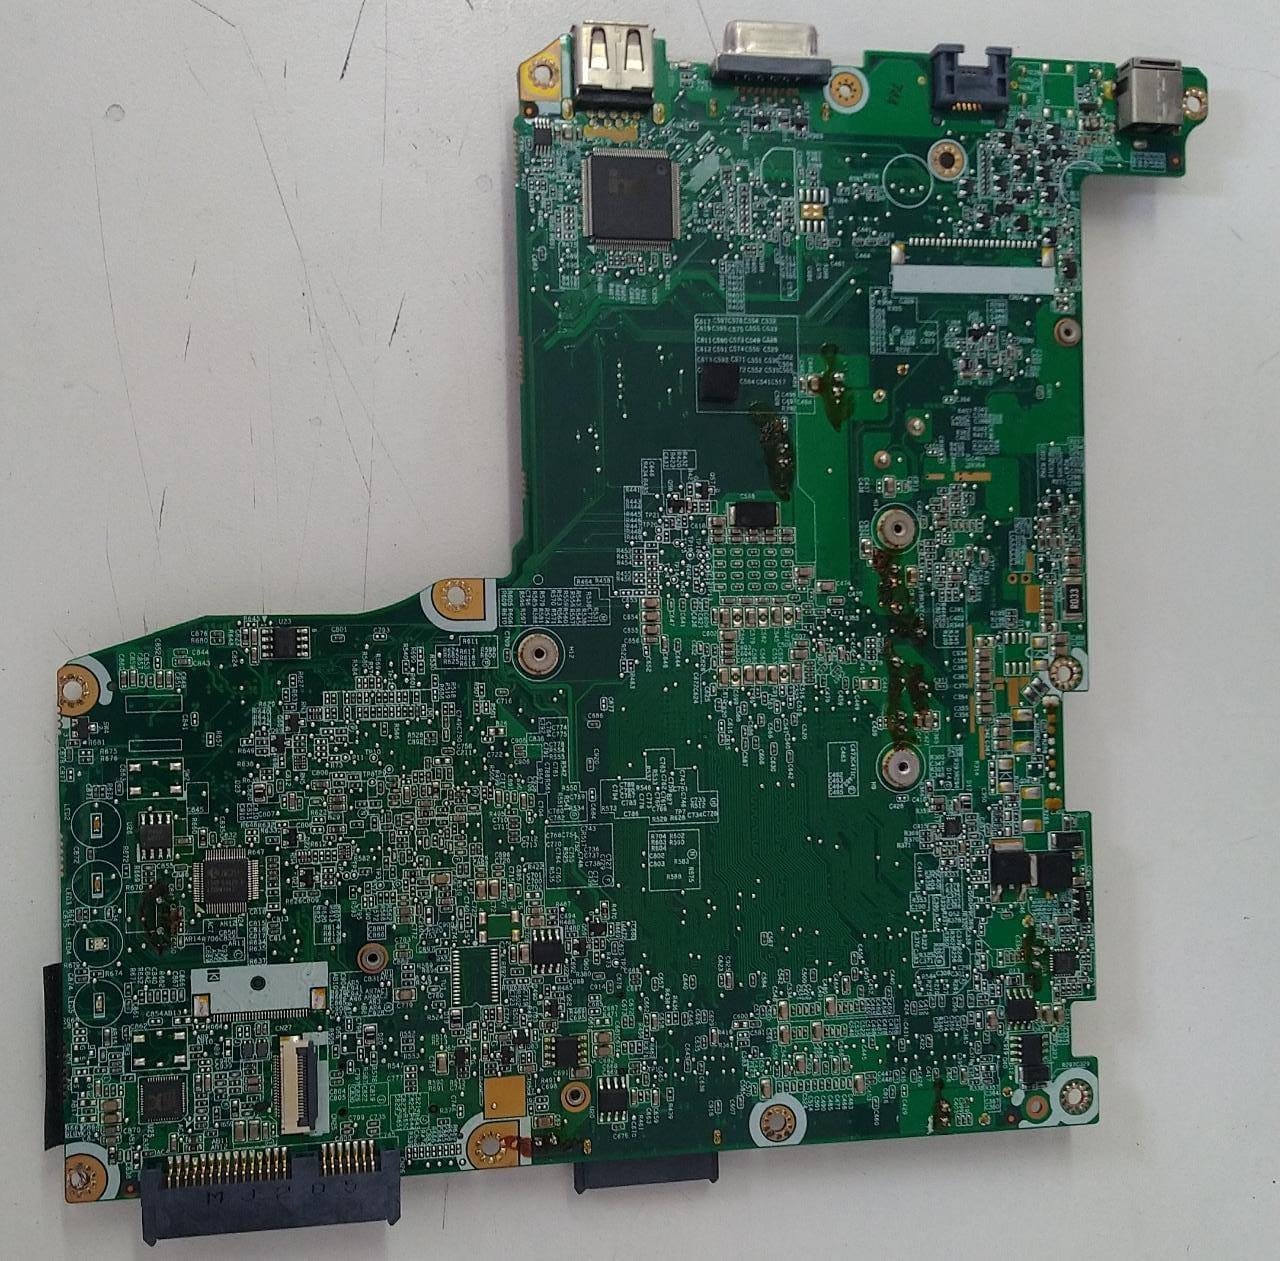 Placa mãe Notebook - 71R-A14HV6-T840